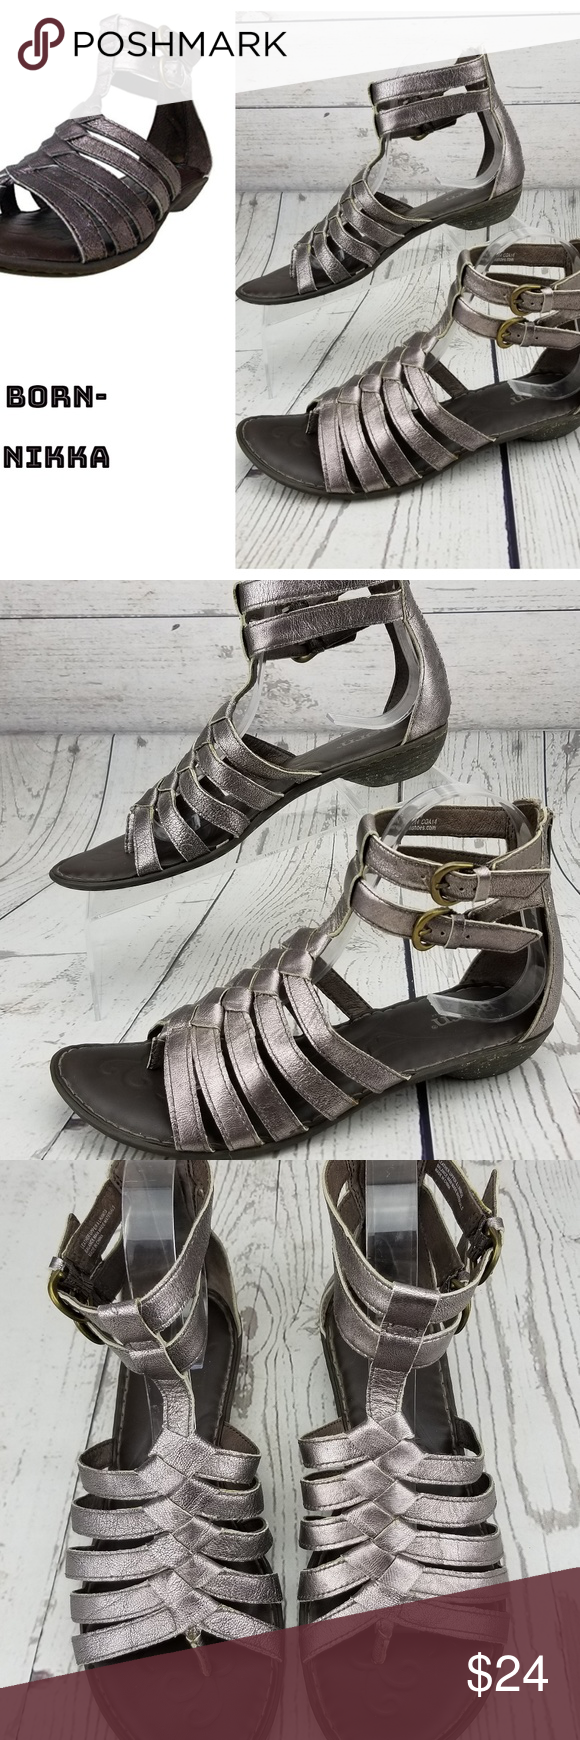 b73a9b86b269 Born Nikka Pewter Gladiator Sandals Leather 8 Born Sandals  Style  Nikka  Women s Size 8